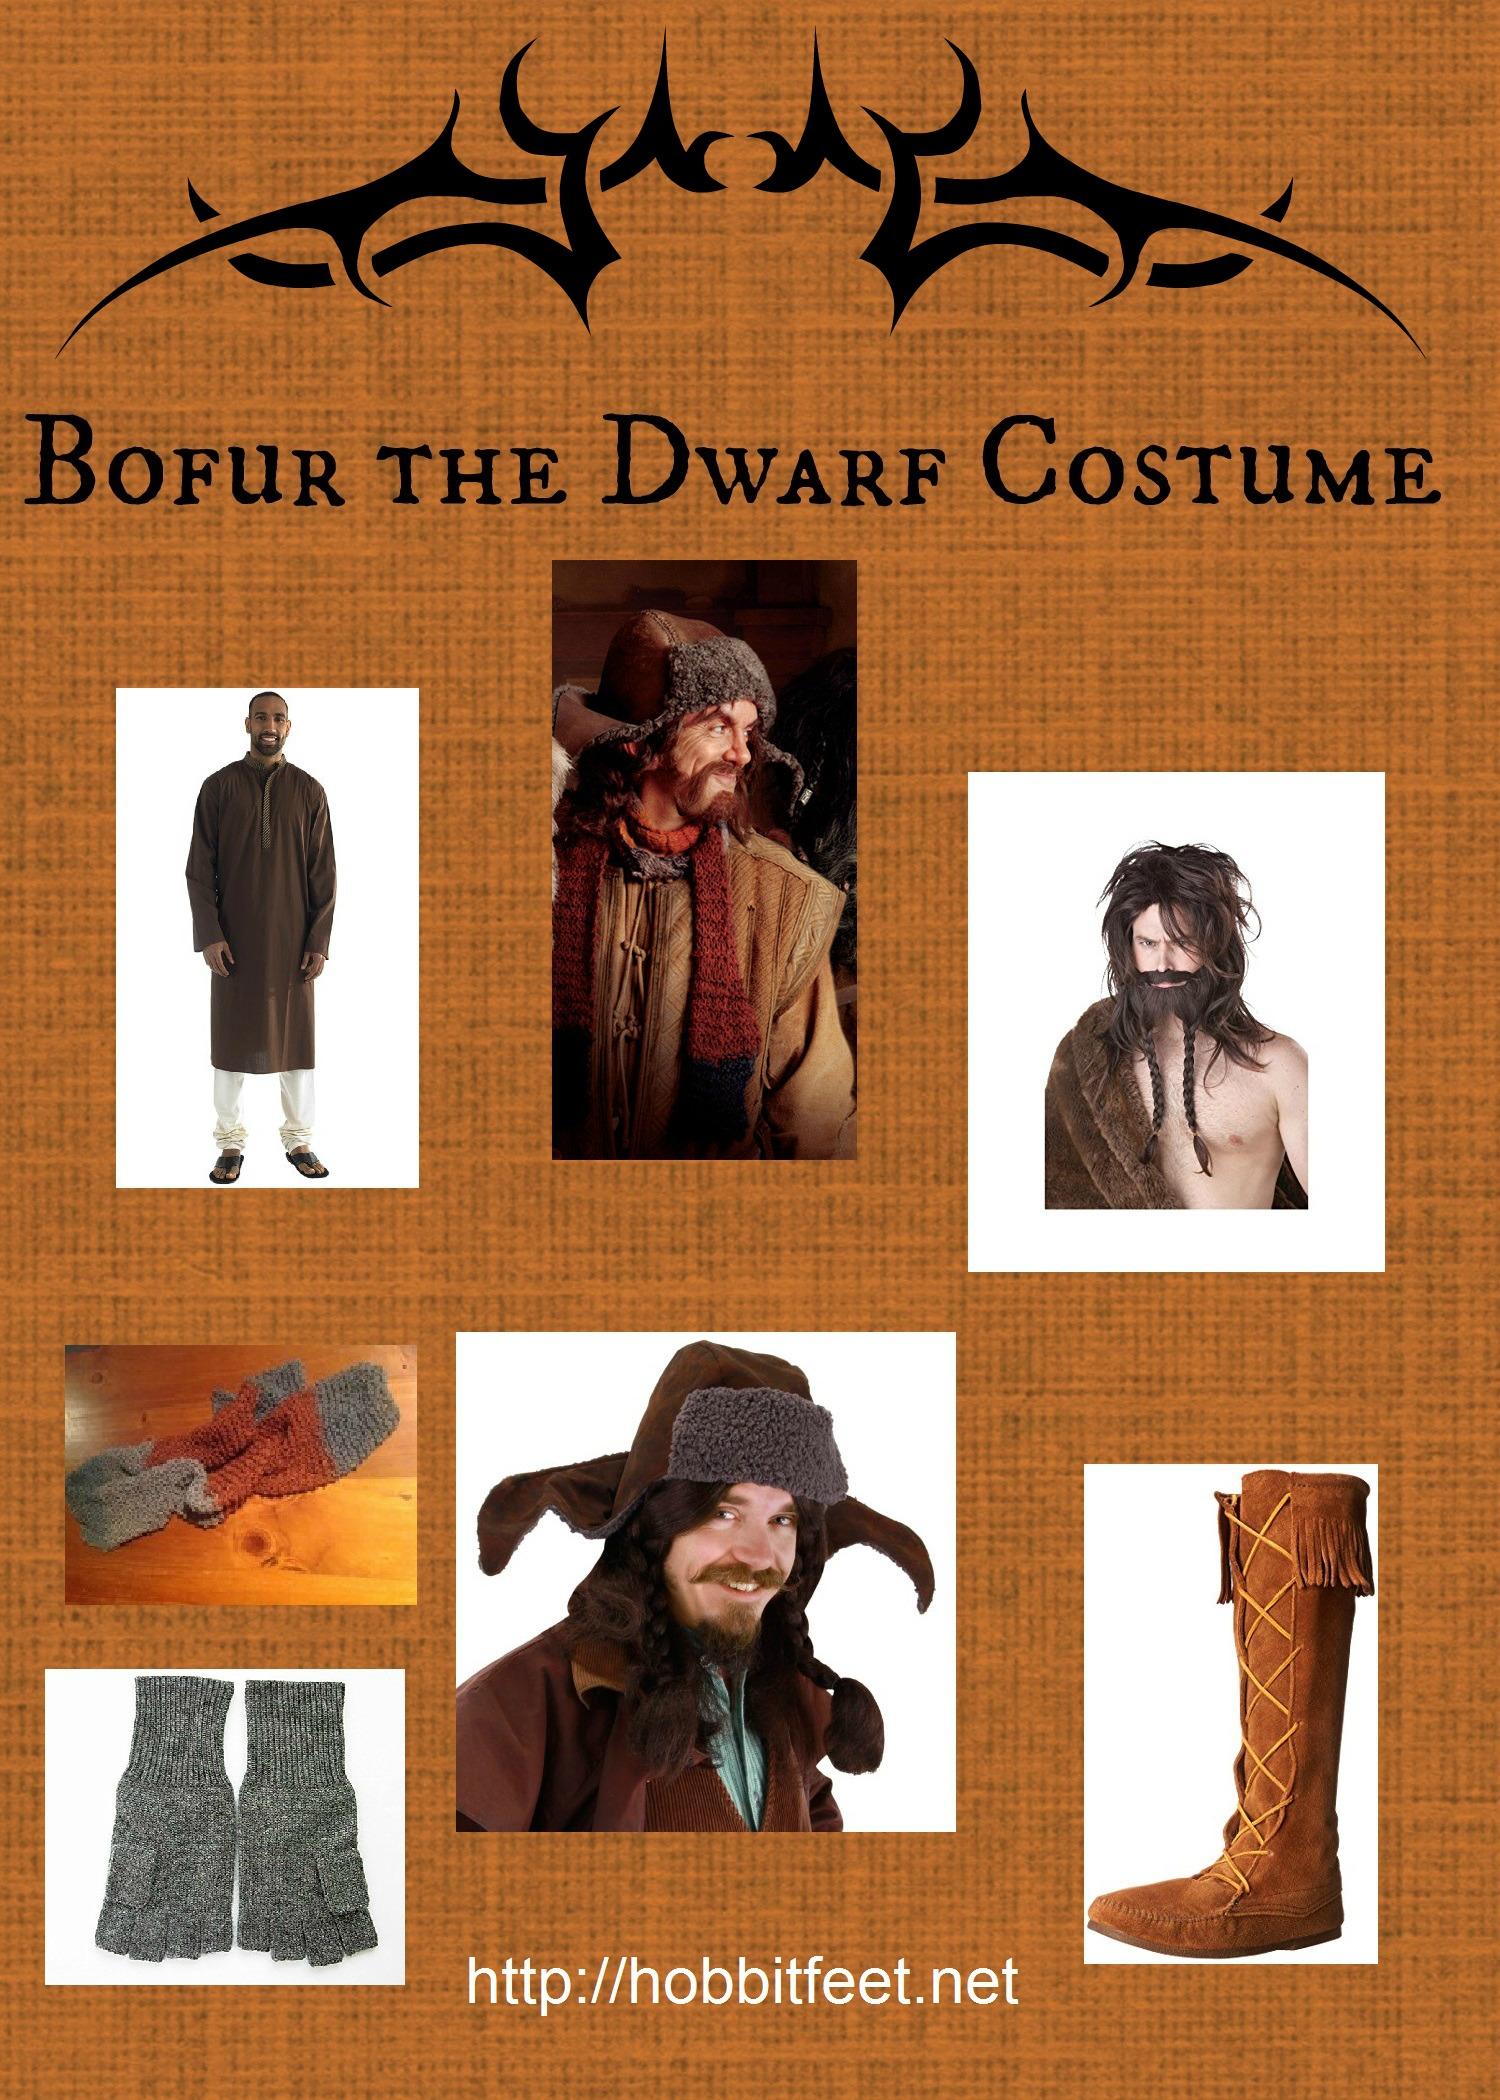 Bofur the Dwarf Costume